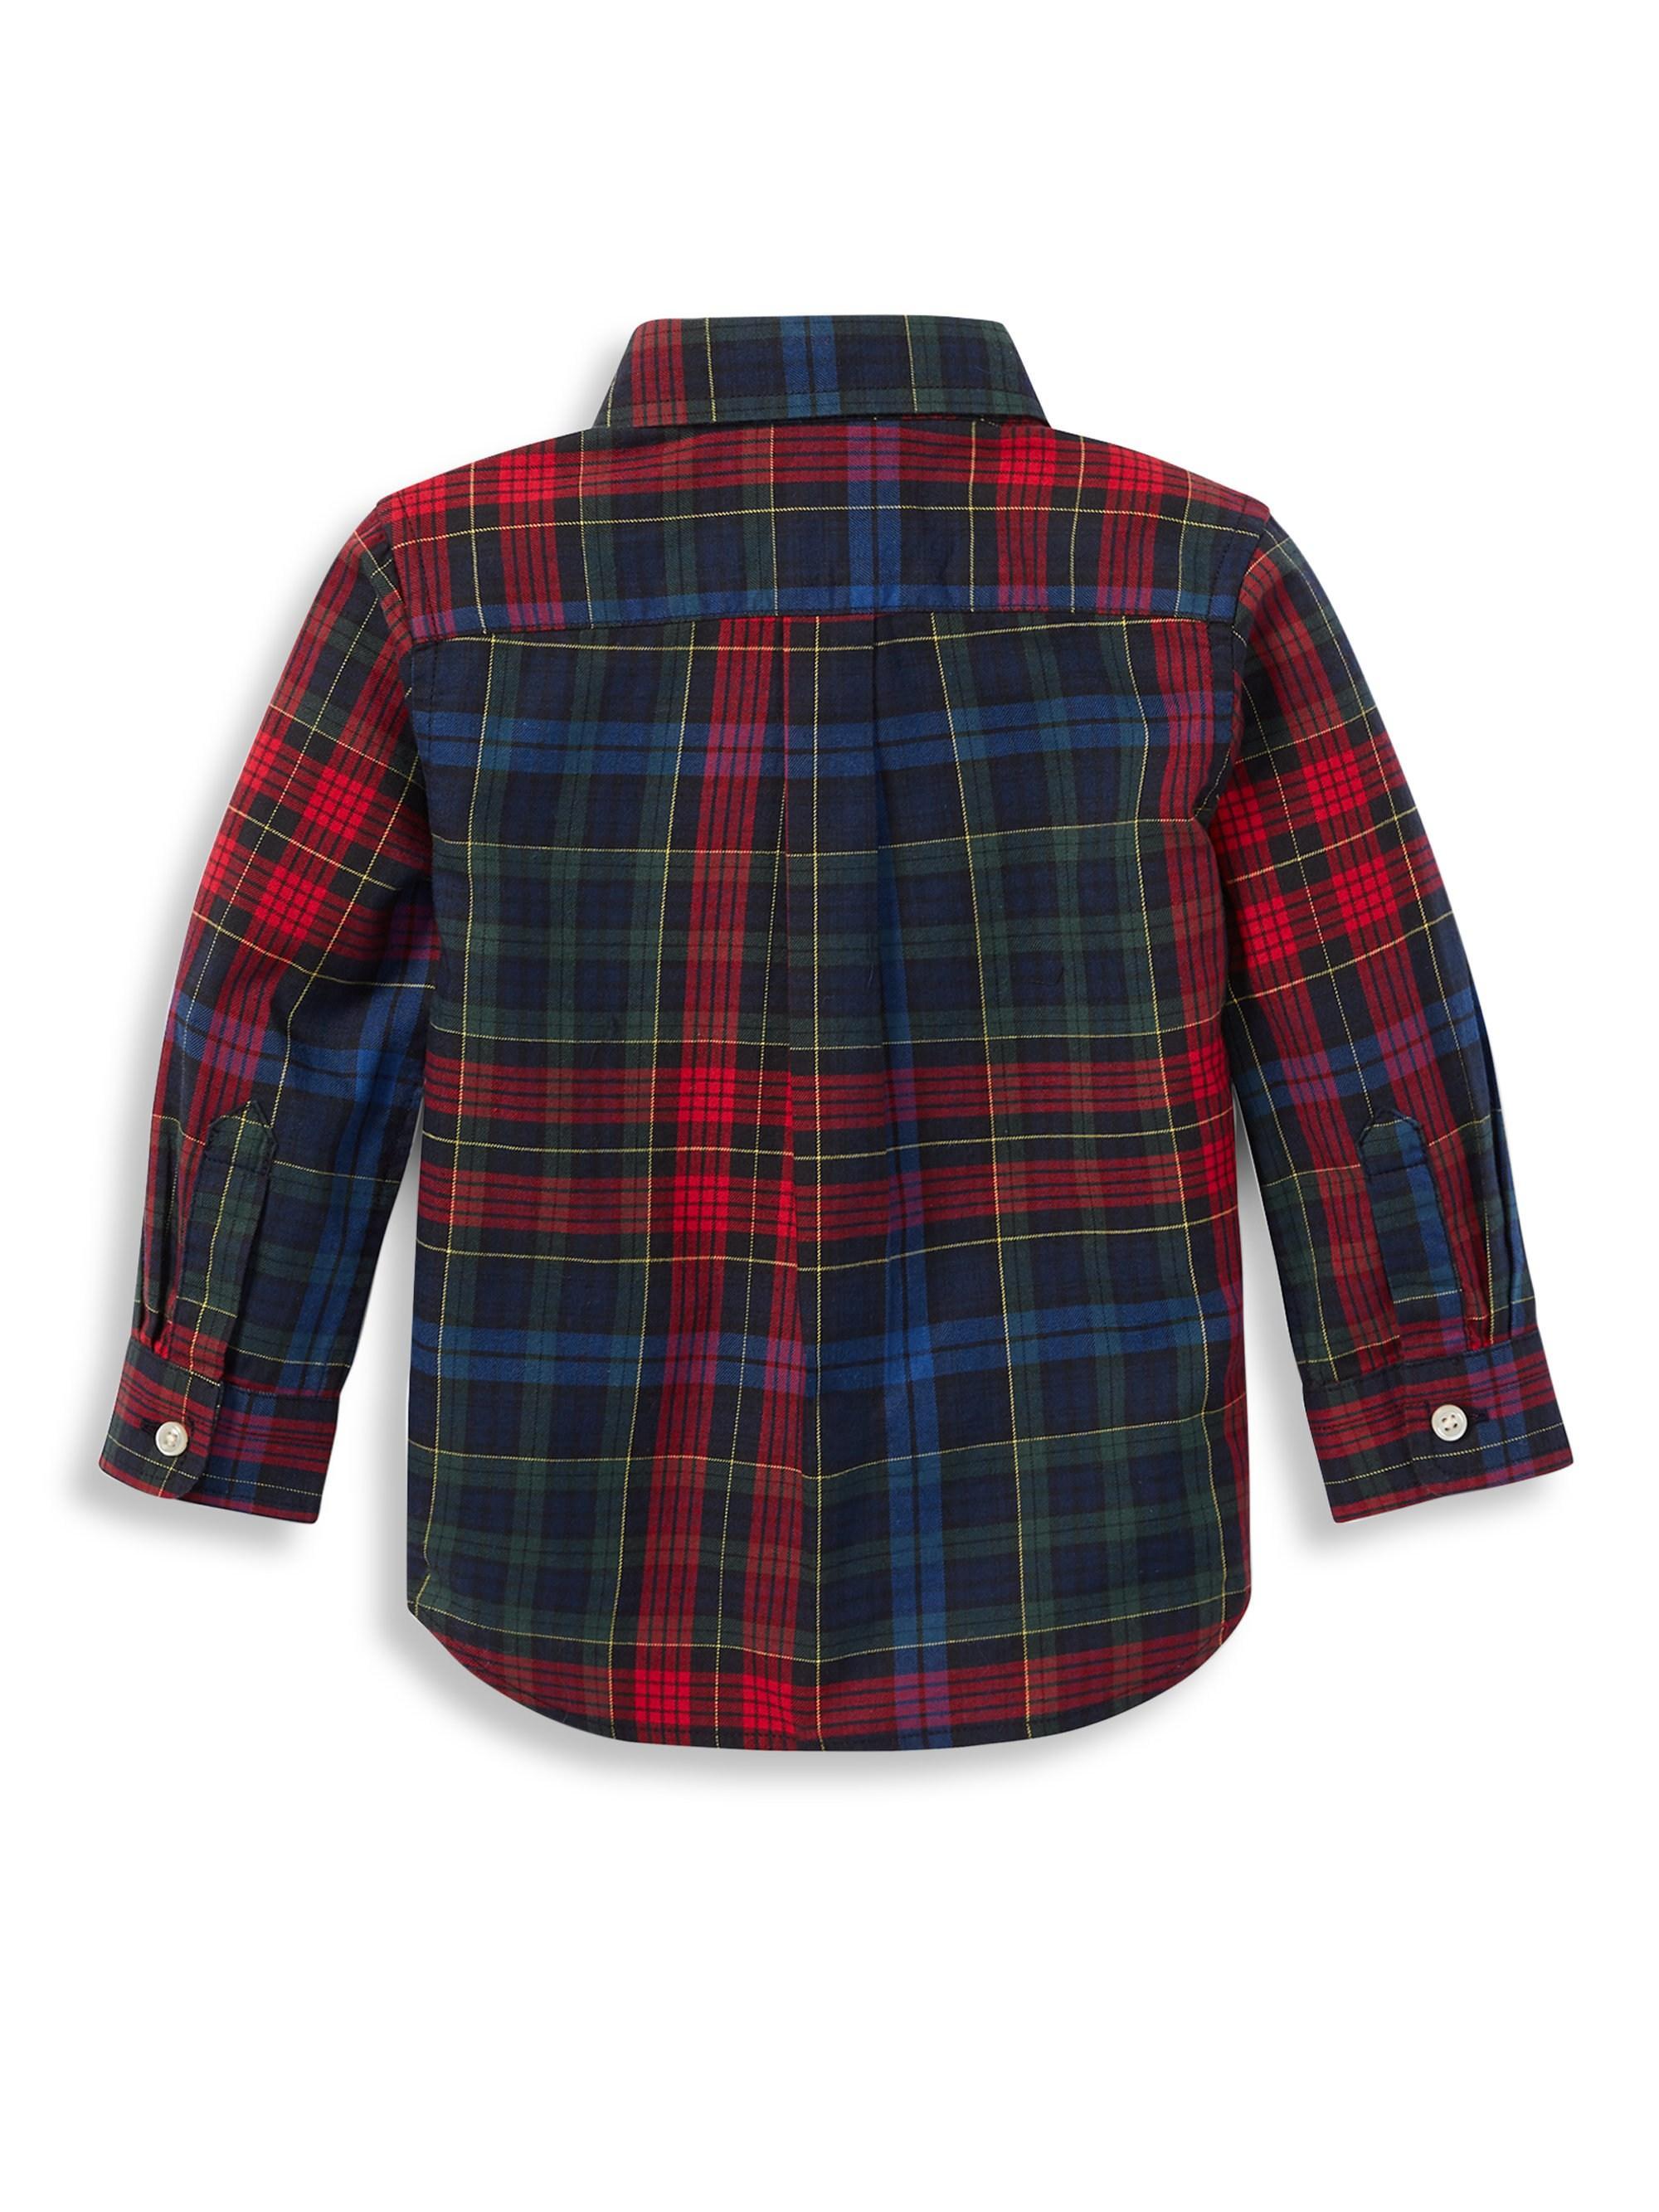 207c730e0 Lyst - Ralph Lauren Baby Boy's Plaid Cotton Twill Shirt for Men